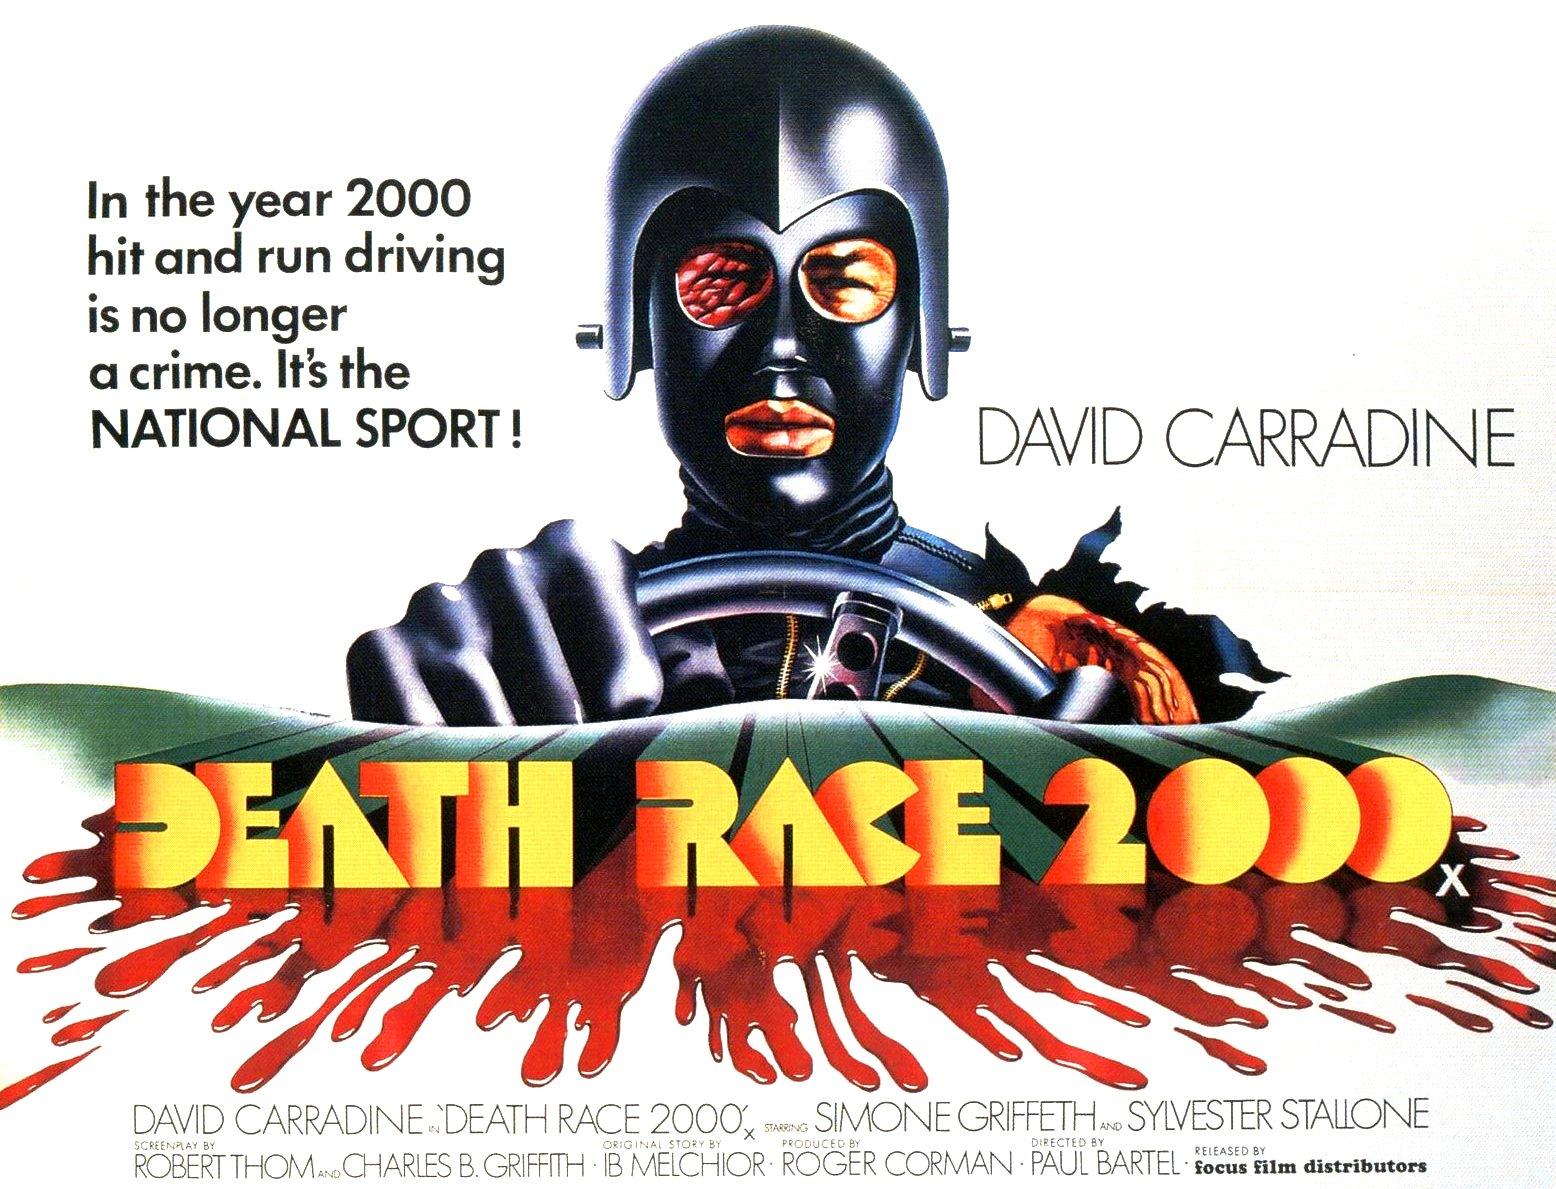 http://2.bp.blogspot.com/-JqkR-9iuhKw/TYVBR2ULwaI/AAAAAAAAI8I/yerMGmMPPNs/s1600/death_race_2000_poster_03.jpg